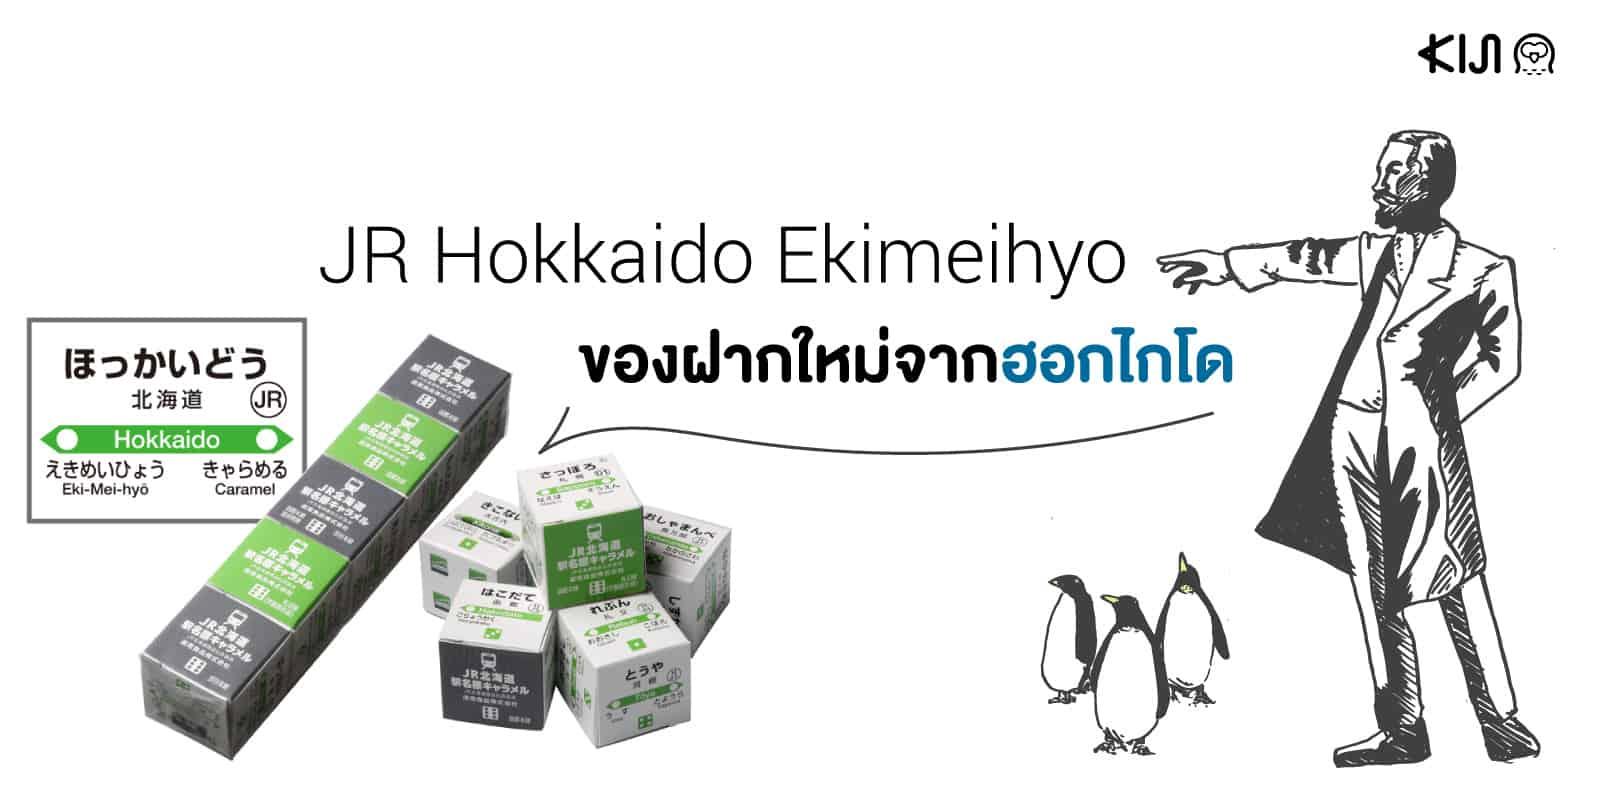 JR Hokkaido